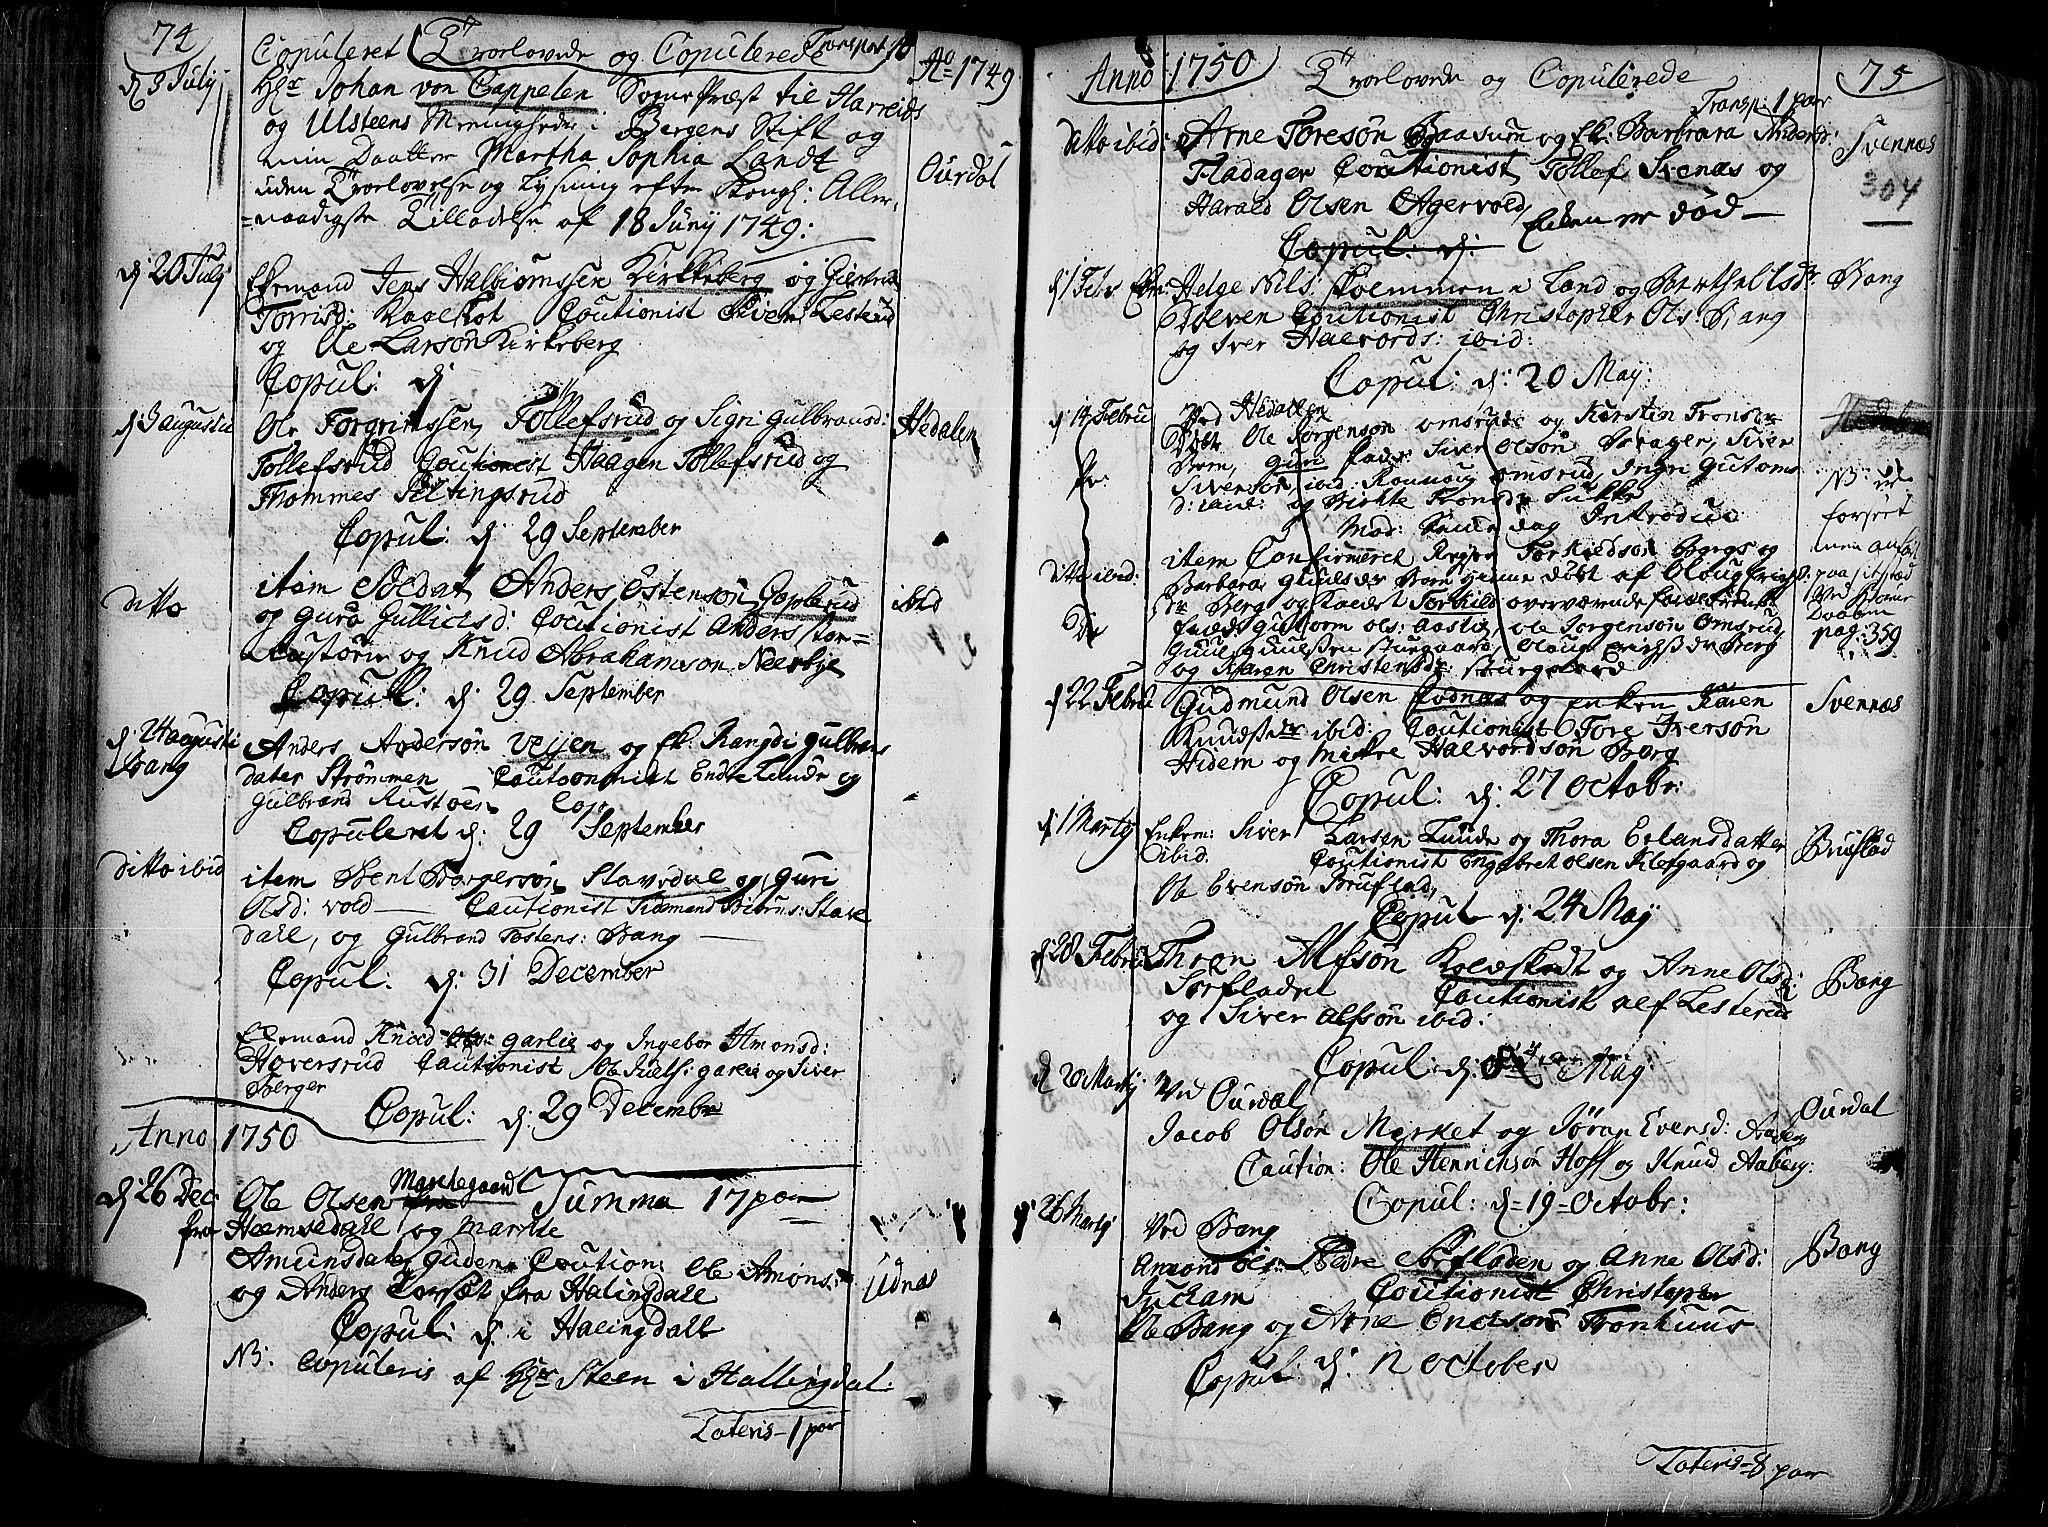 SAH, Aurdal prestekontor, Ministerialbok nr. 4, 1730-1762, s. 74-75